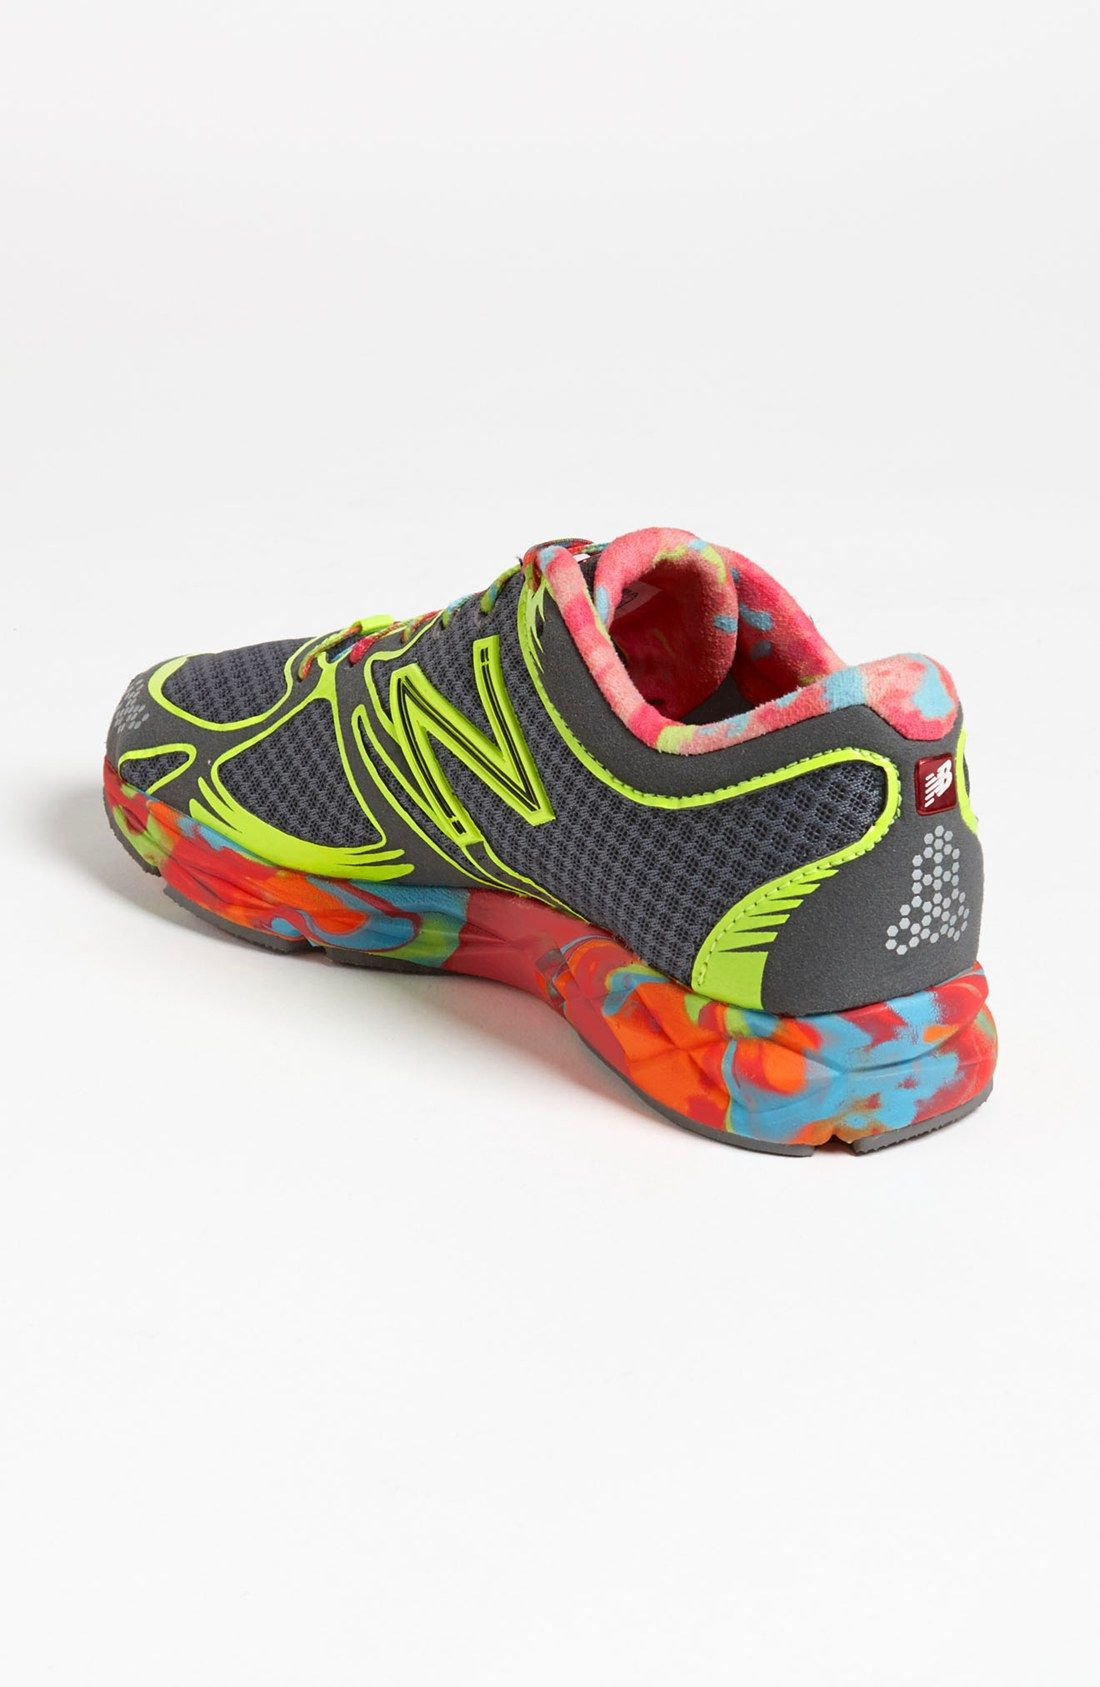 new balance 1400 womens shoes